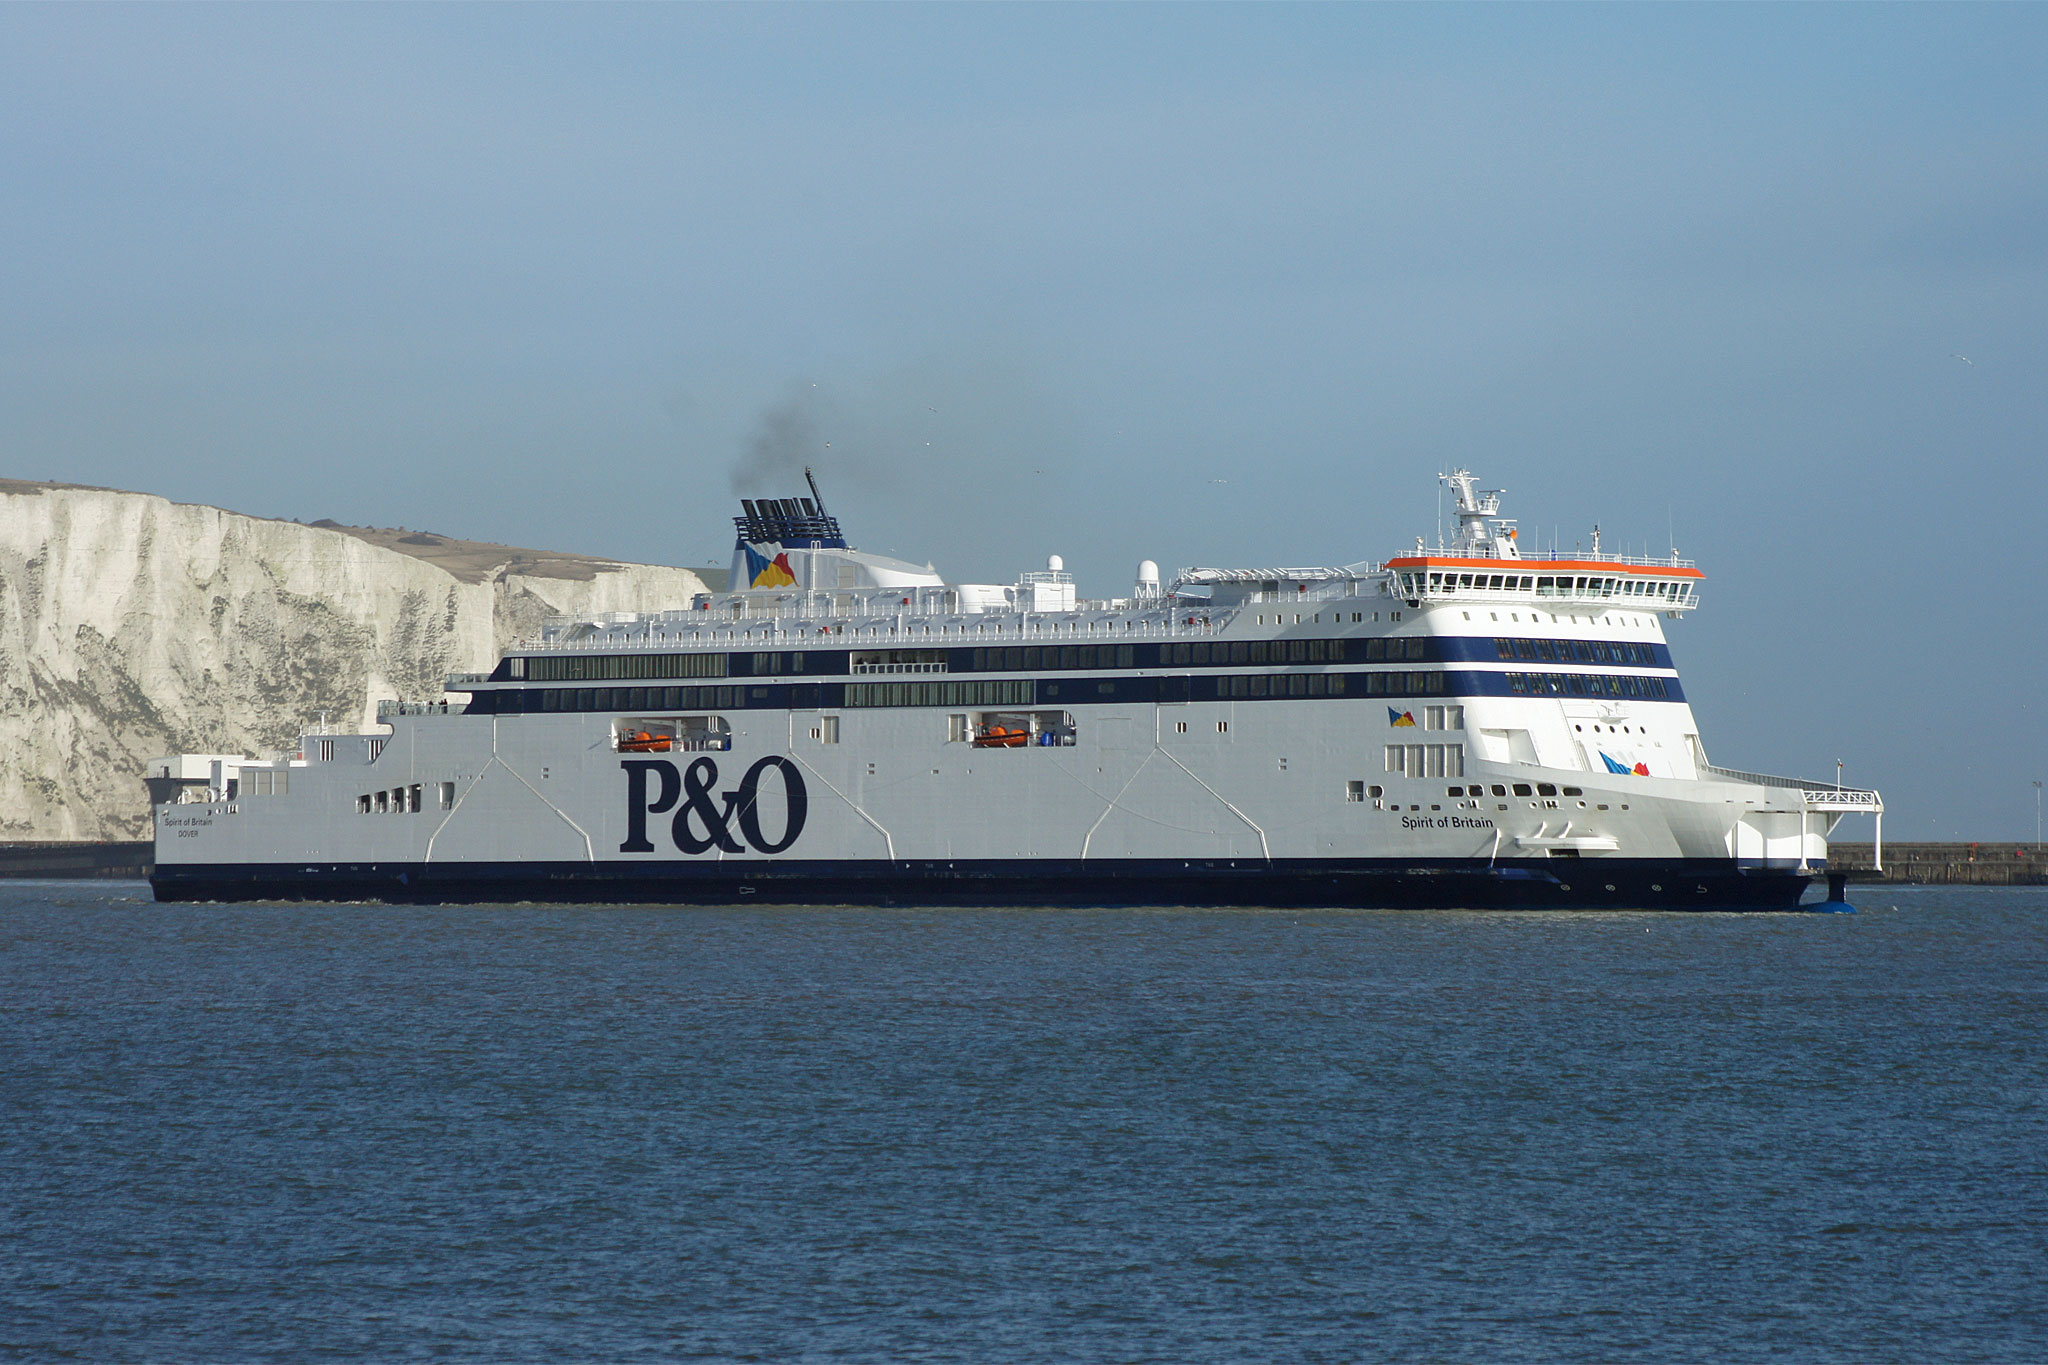 SPIRIT OF BRITAIN 2010 - P&O Ferries - www simplonpc co uk